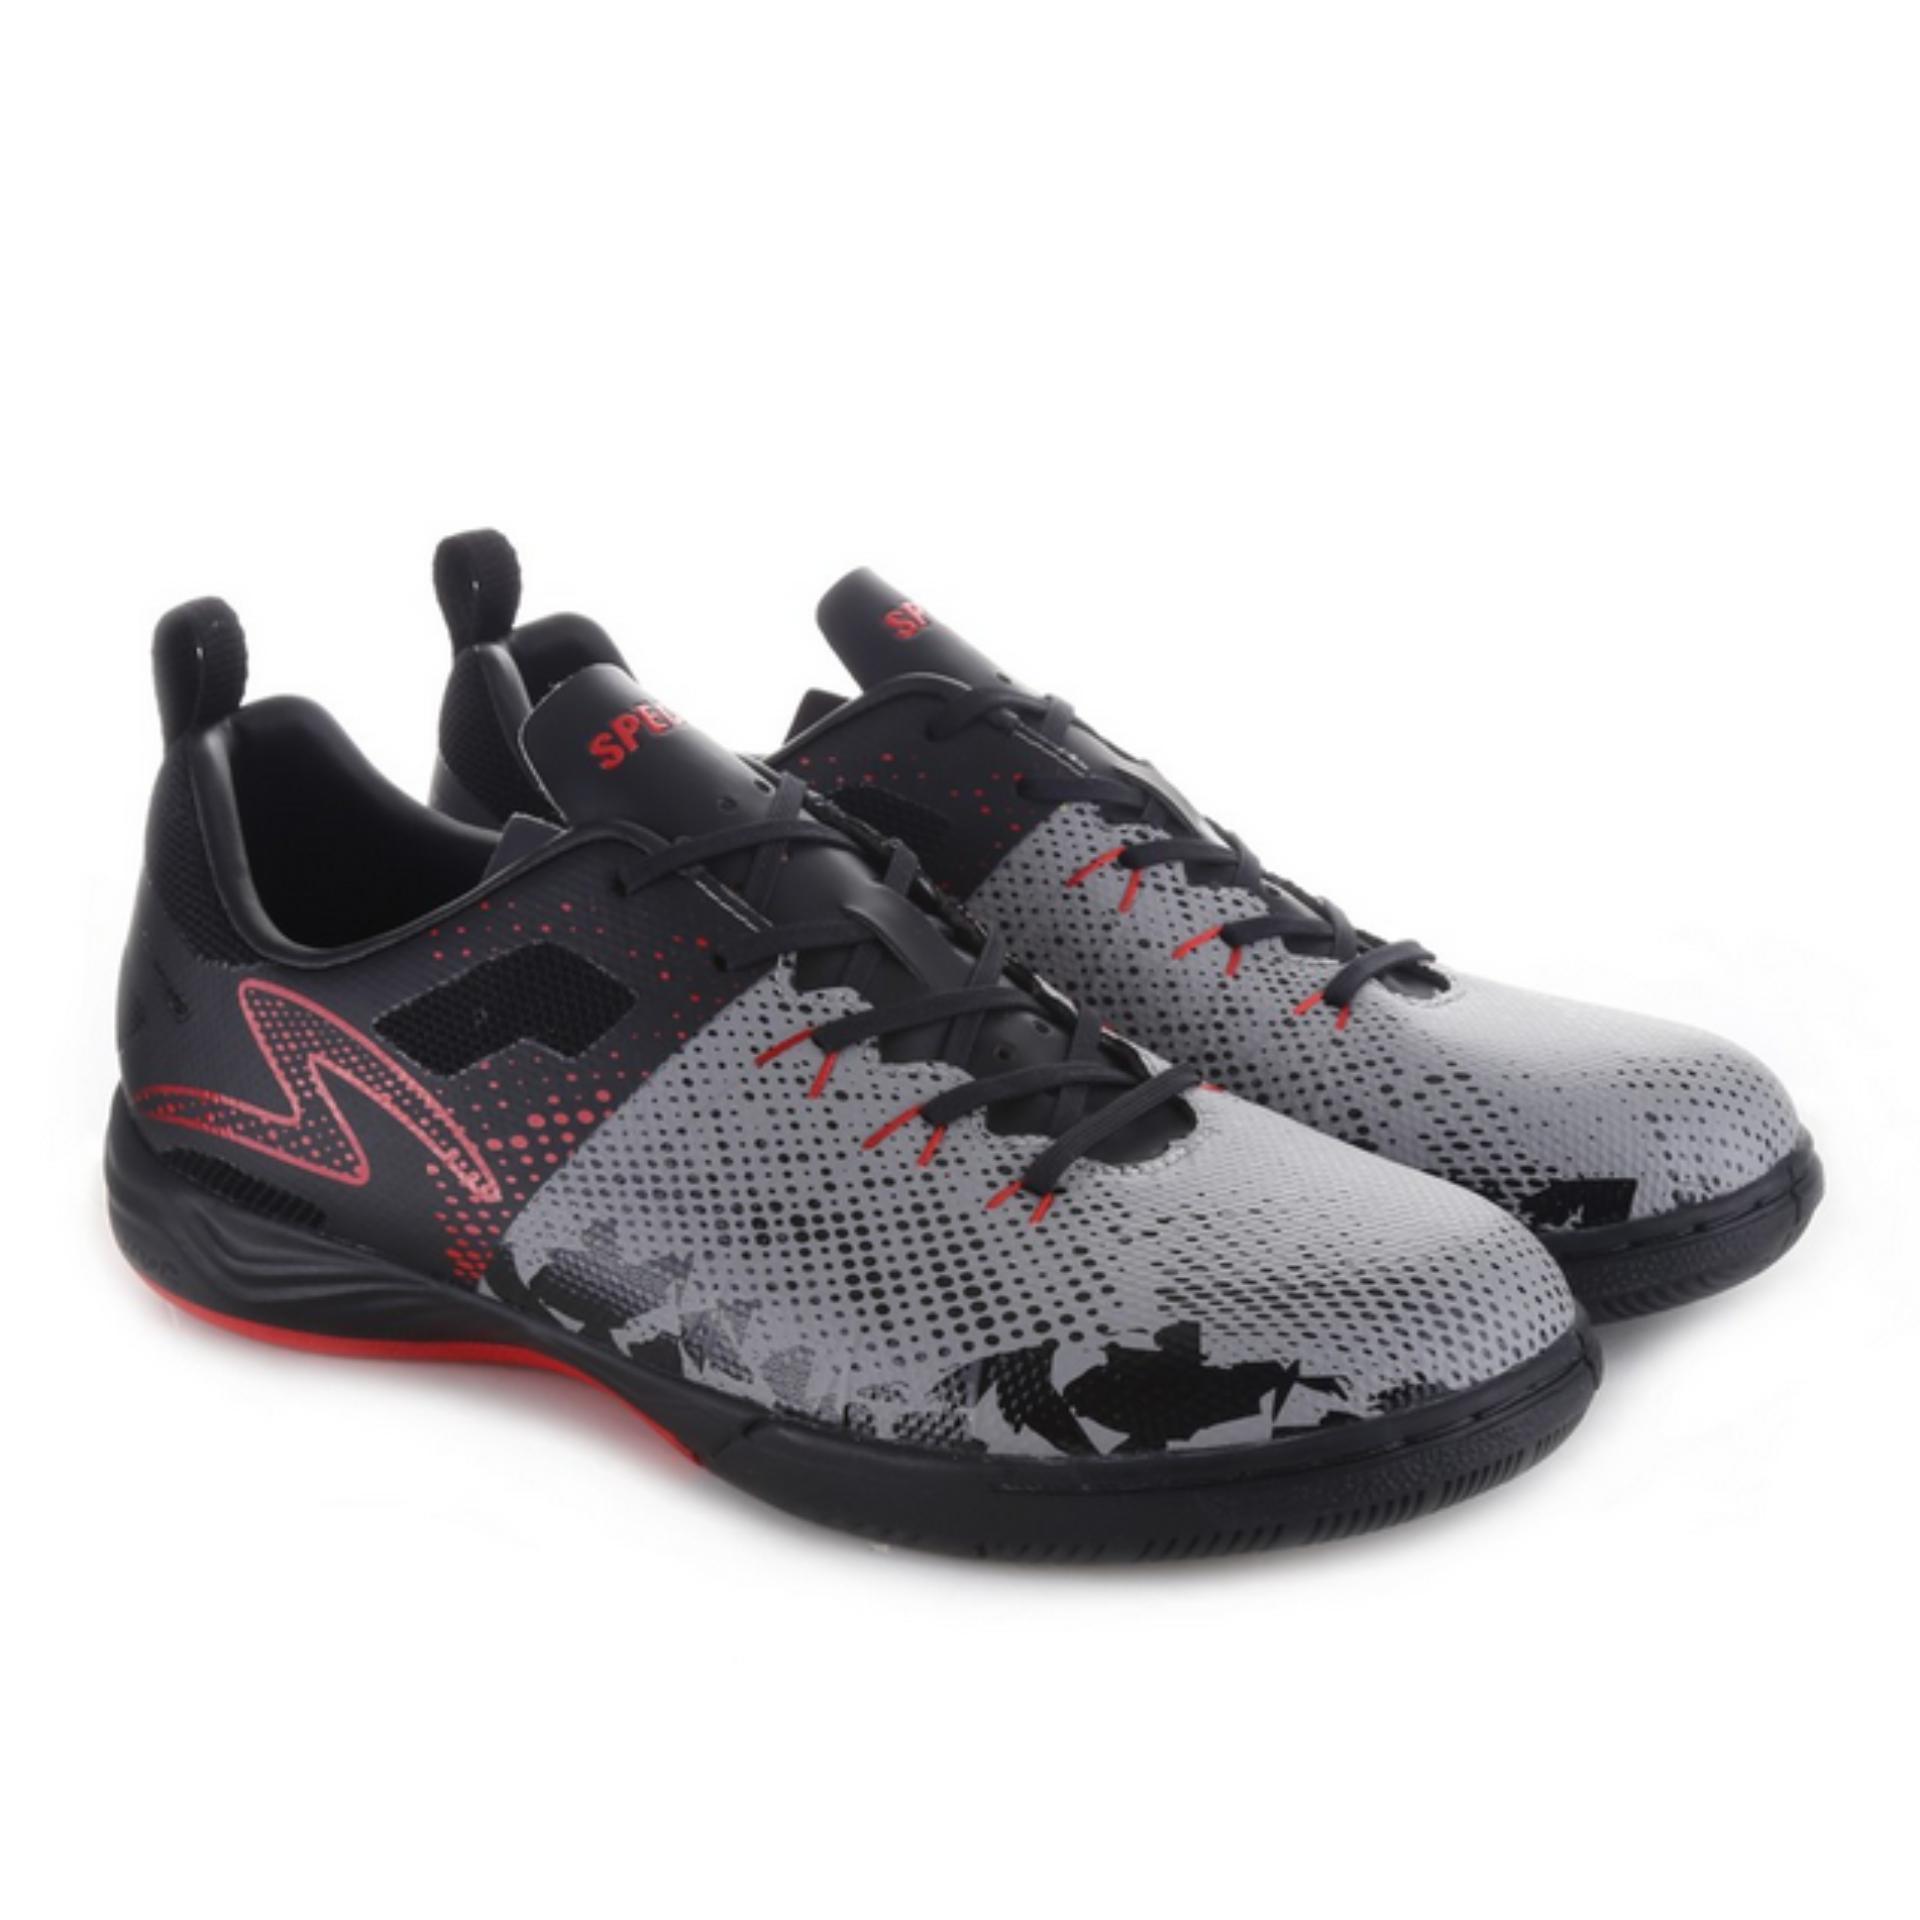 Specs Metasala Combat Cool Grey Black Emperor Red | Sepatu Futsal